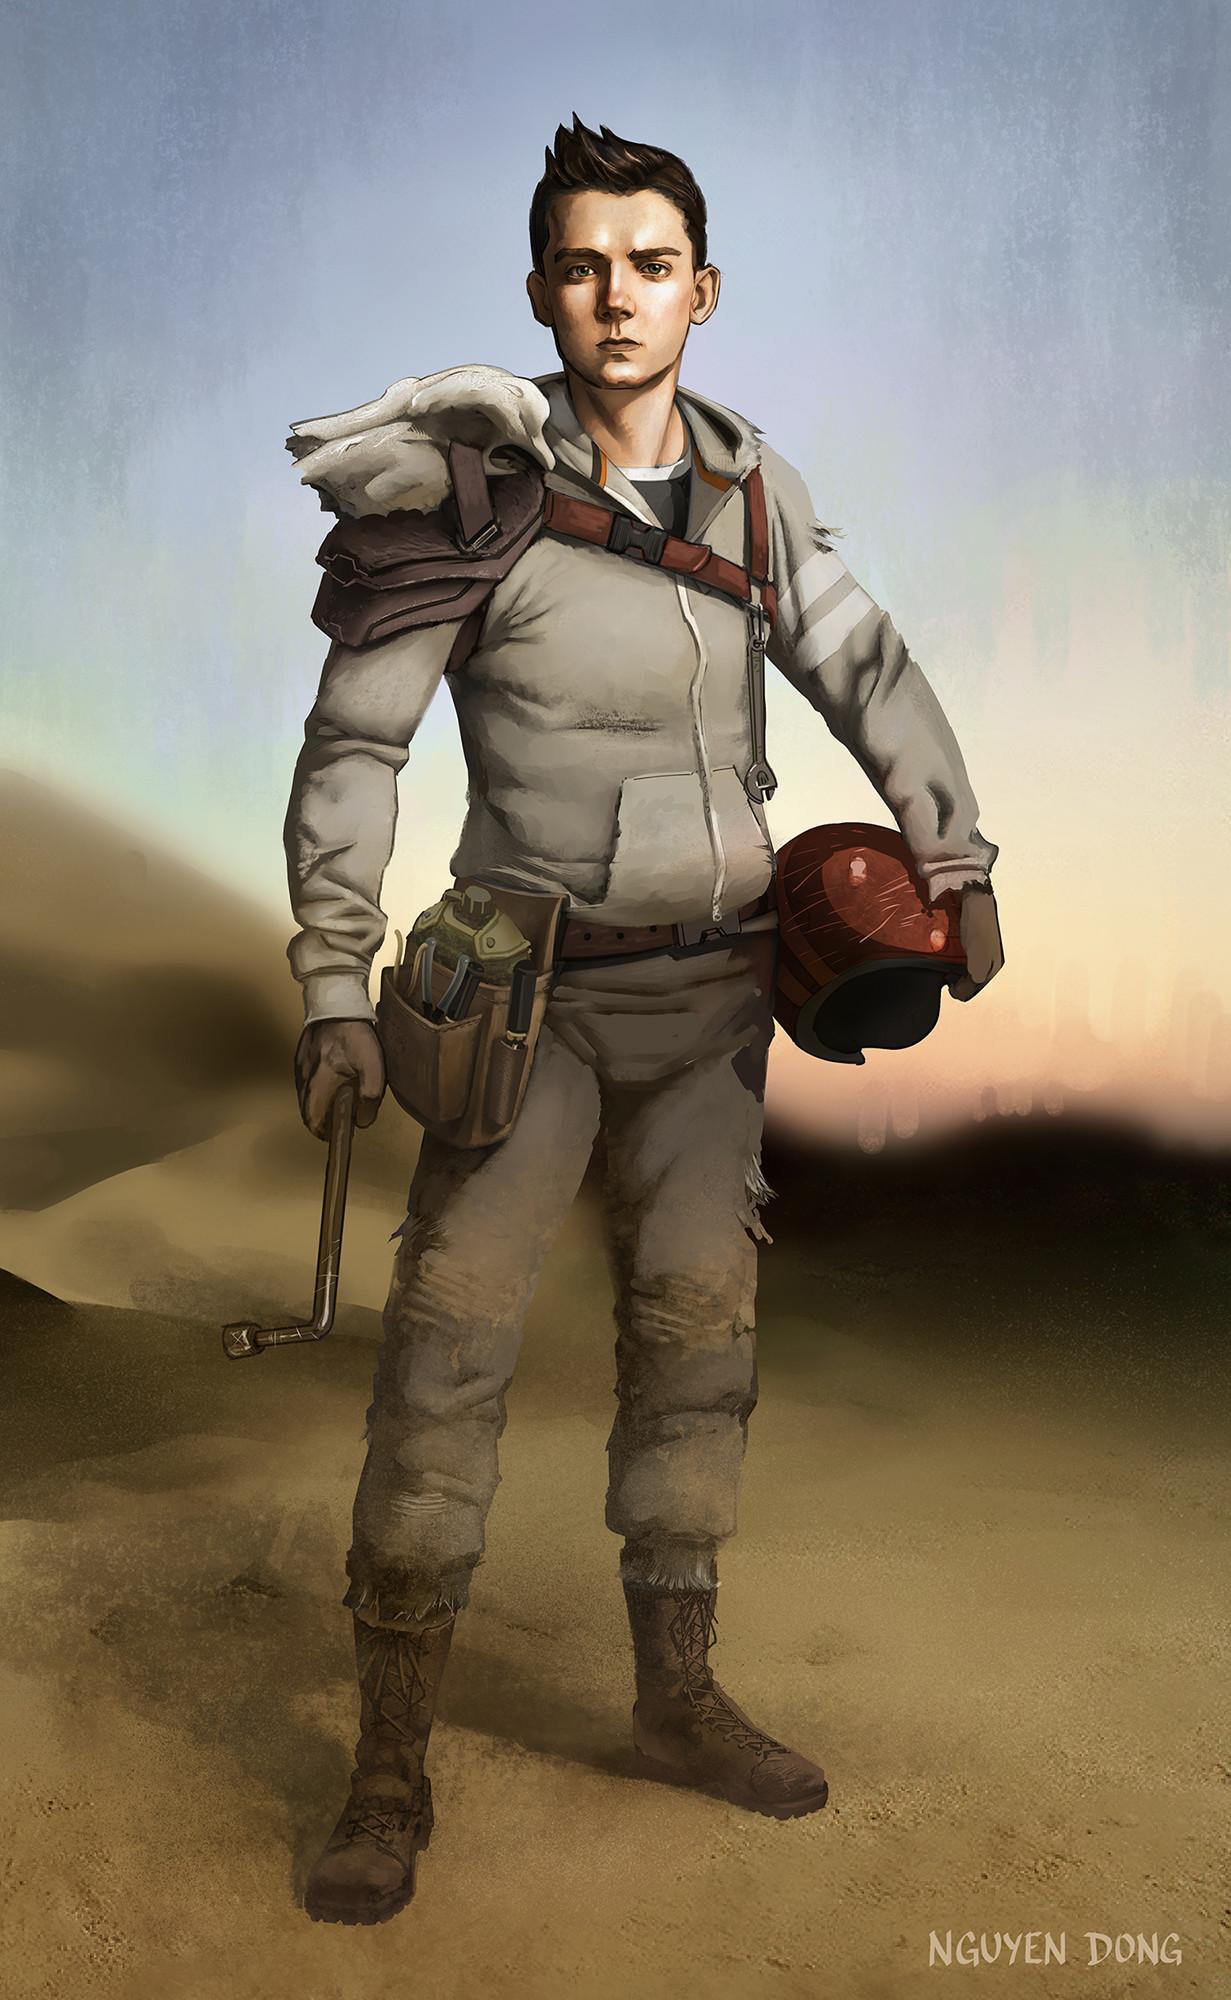 Hanz Blackfingers - Mechanic Teen son of a ex-Wasteland farmer